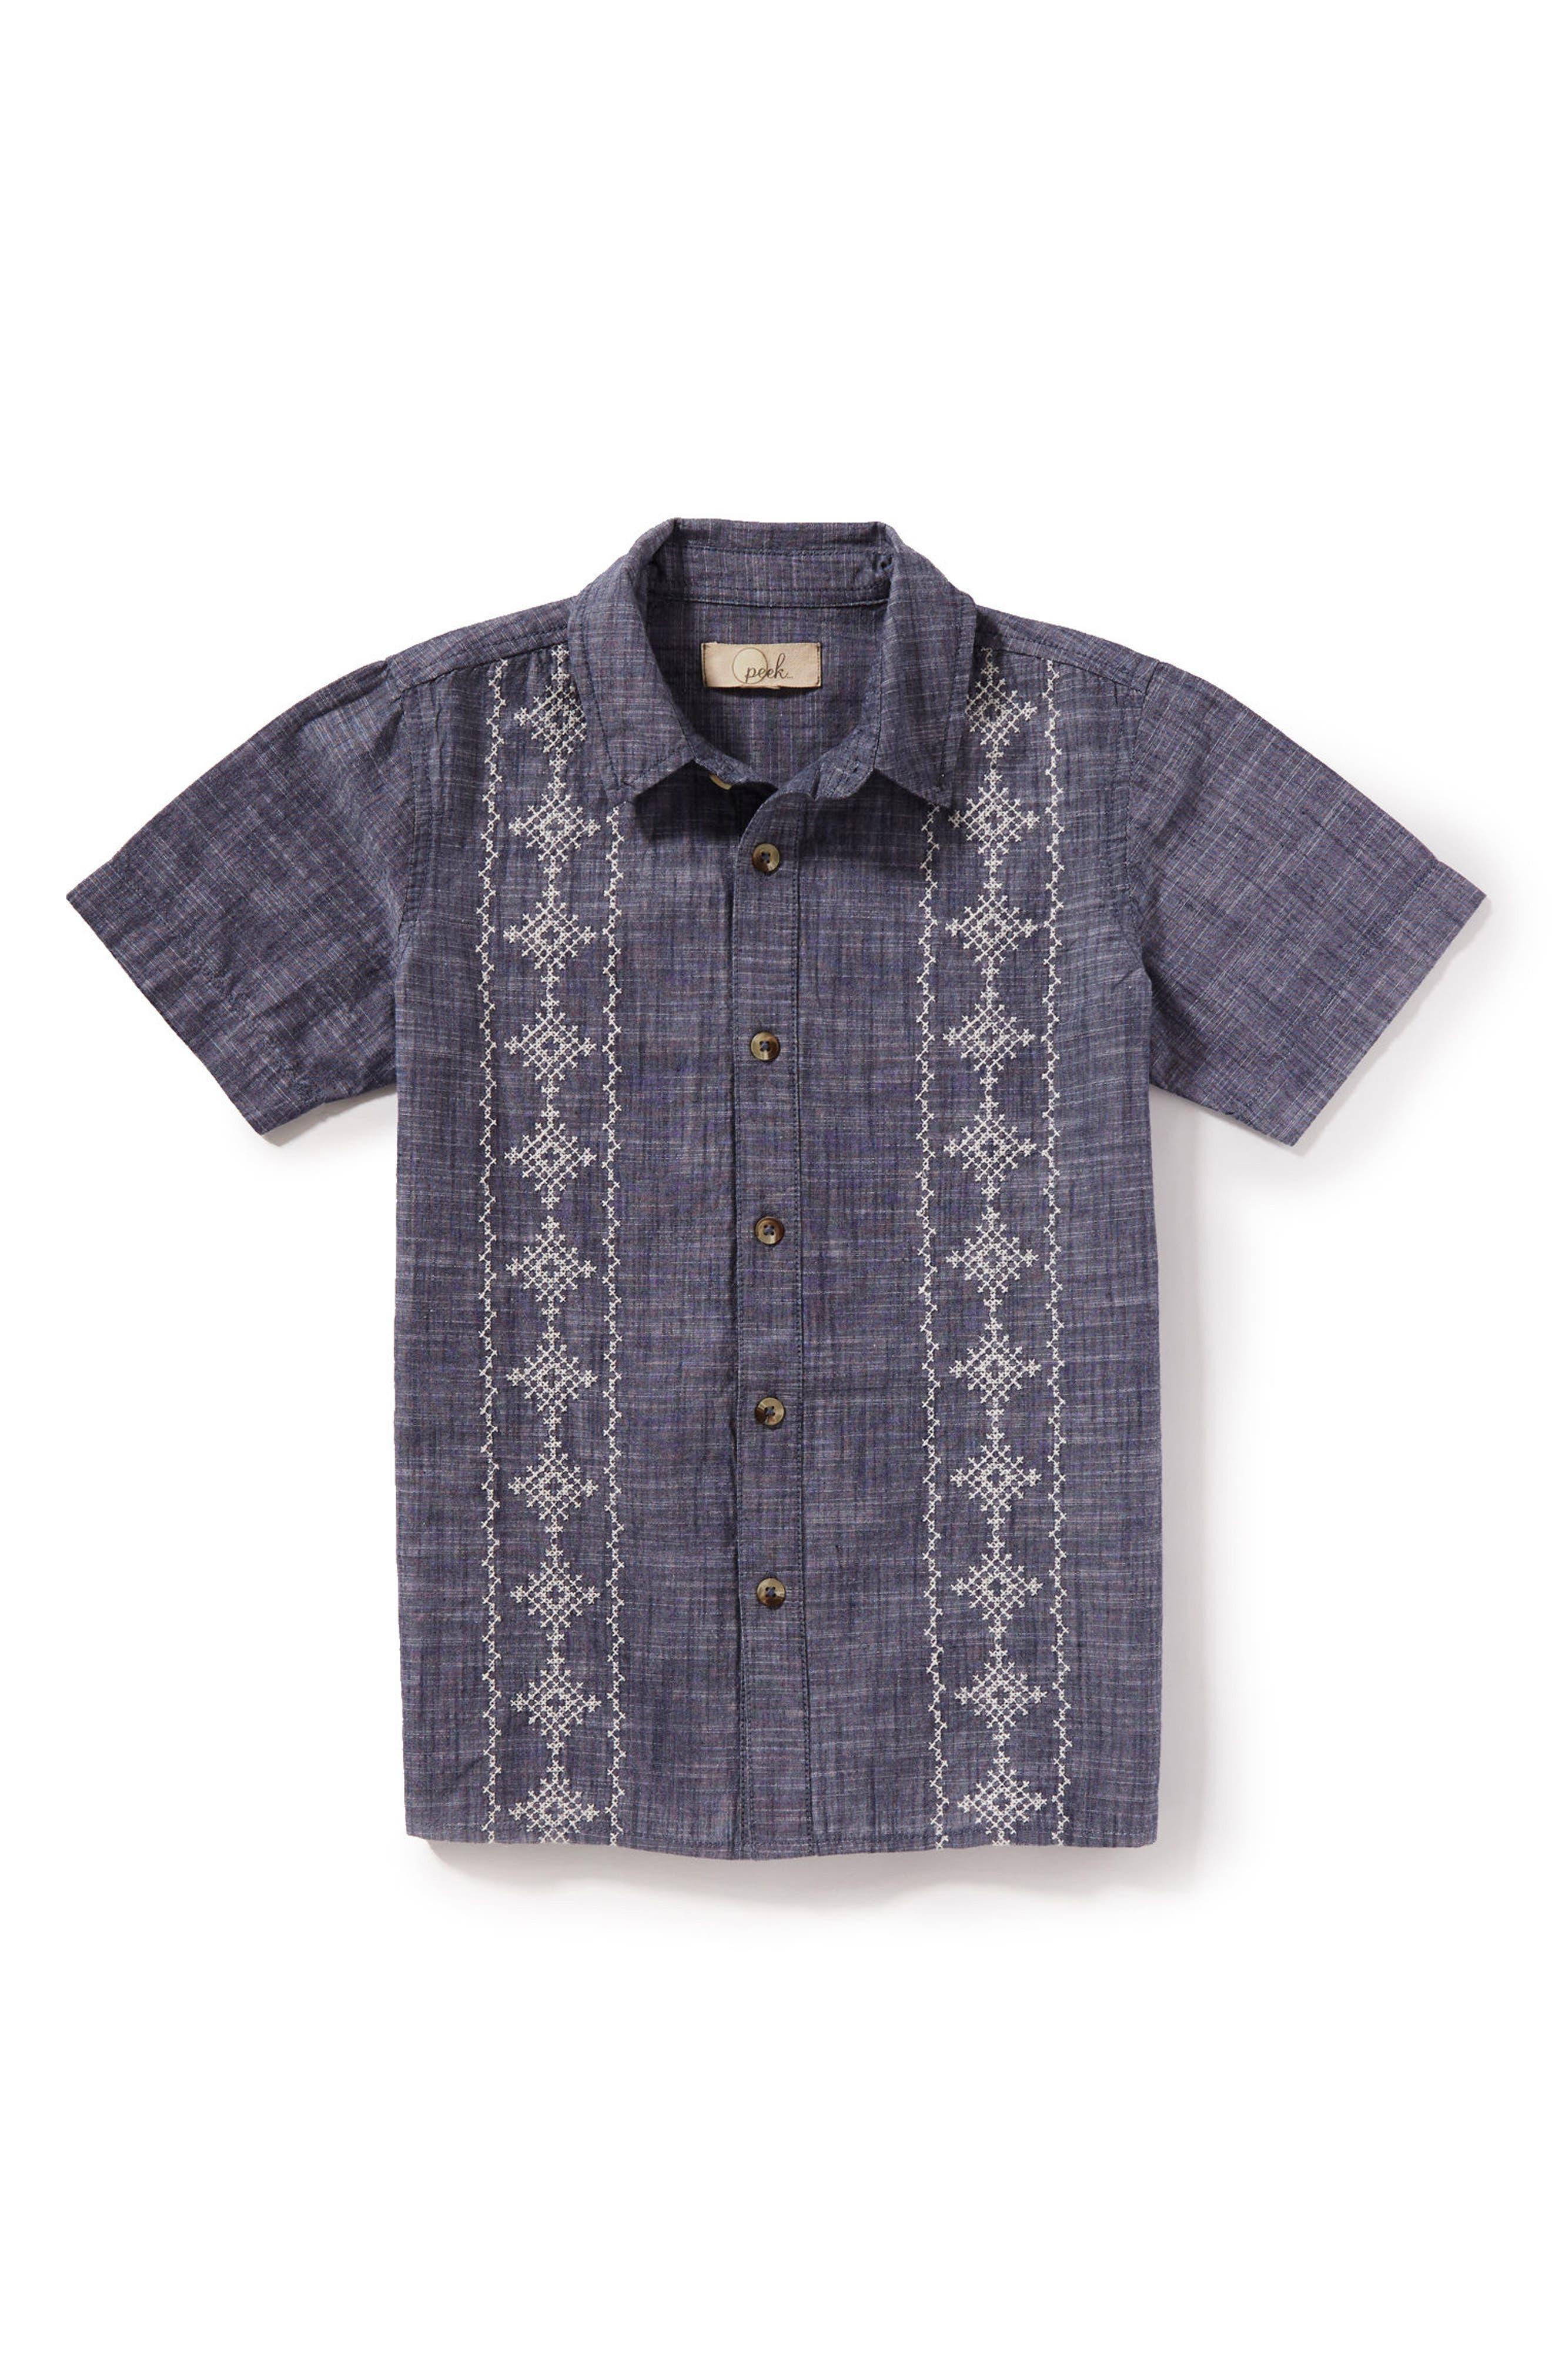 Peek Cuba Woven Shirt,                         Main,                         color, 452